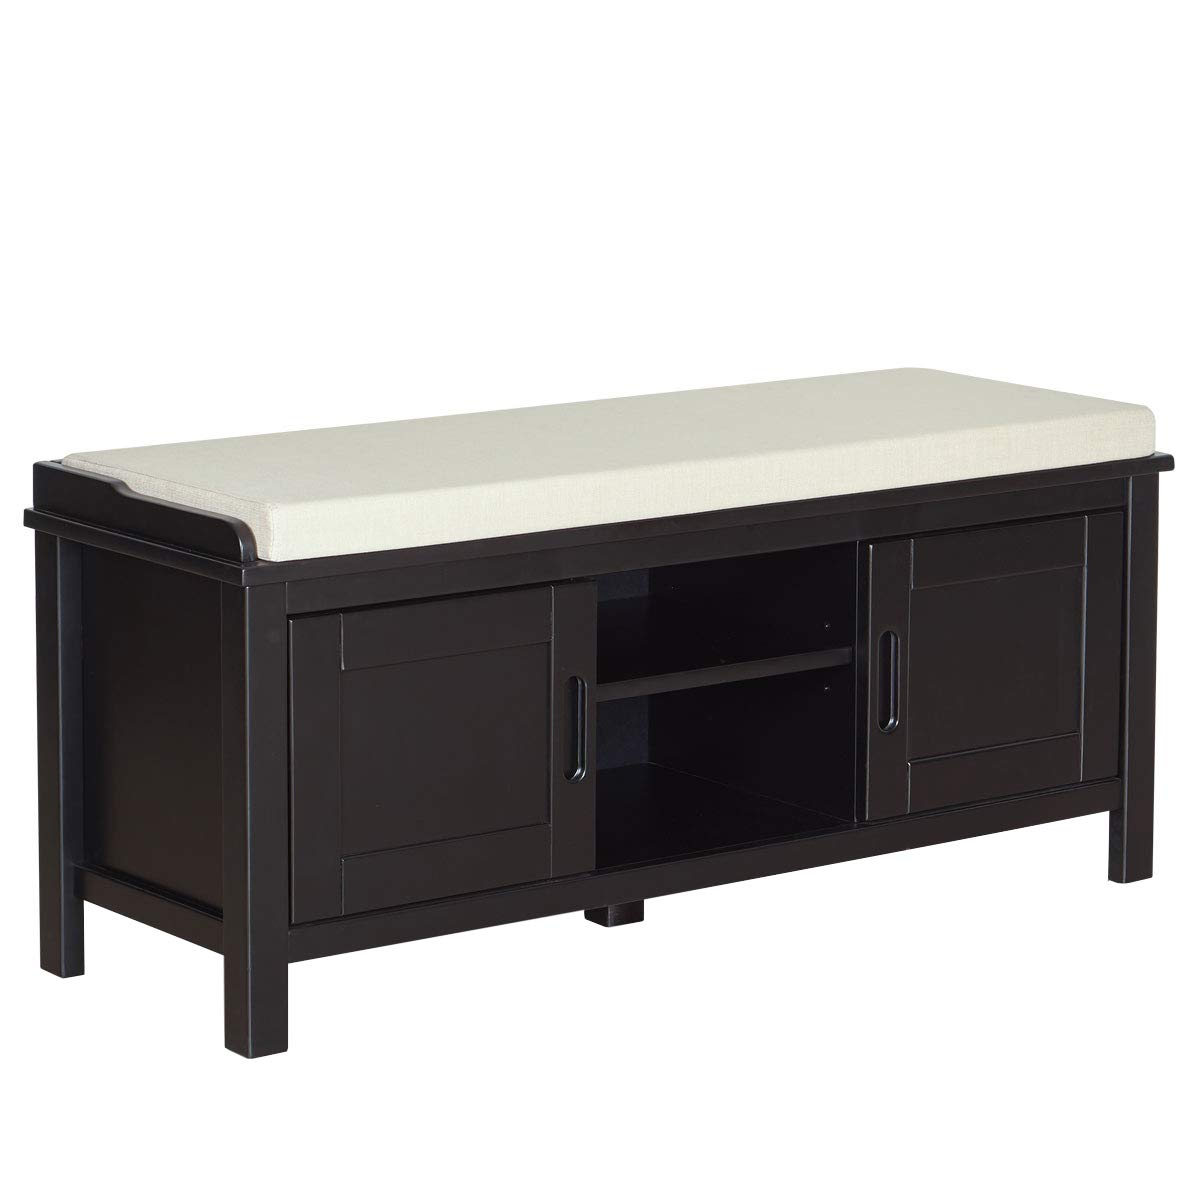 Ravenna Home Classic Solid Pine Storage Bench, 45''W, Black Finish by Ravenna Home